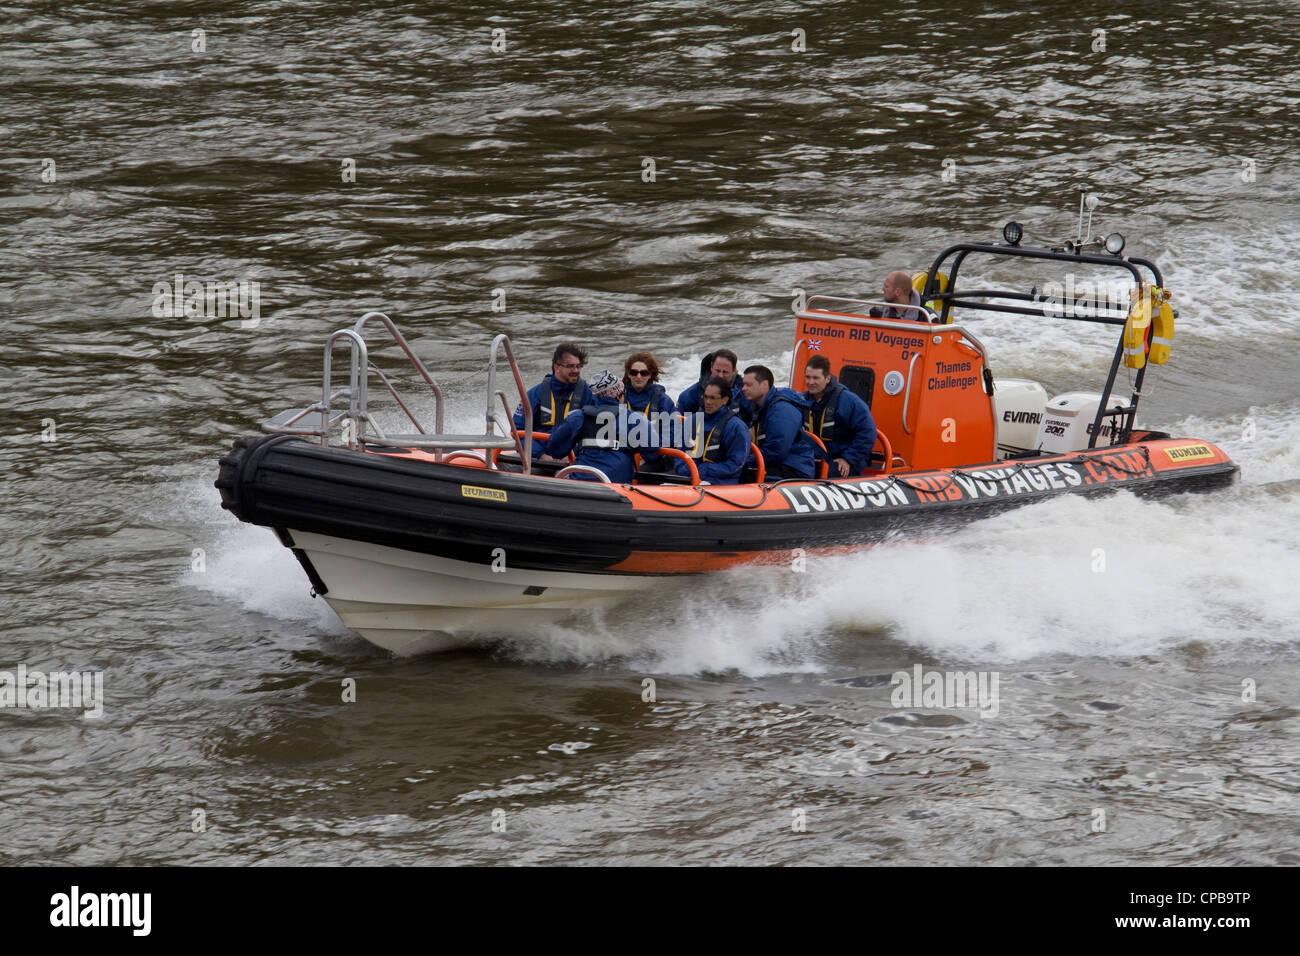 Londres costilla voyage speedboat viaje de placer en Thames Imagen De Stock